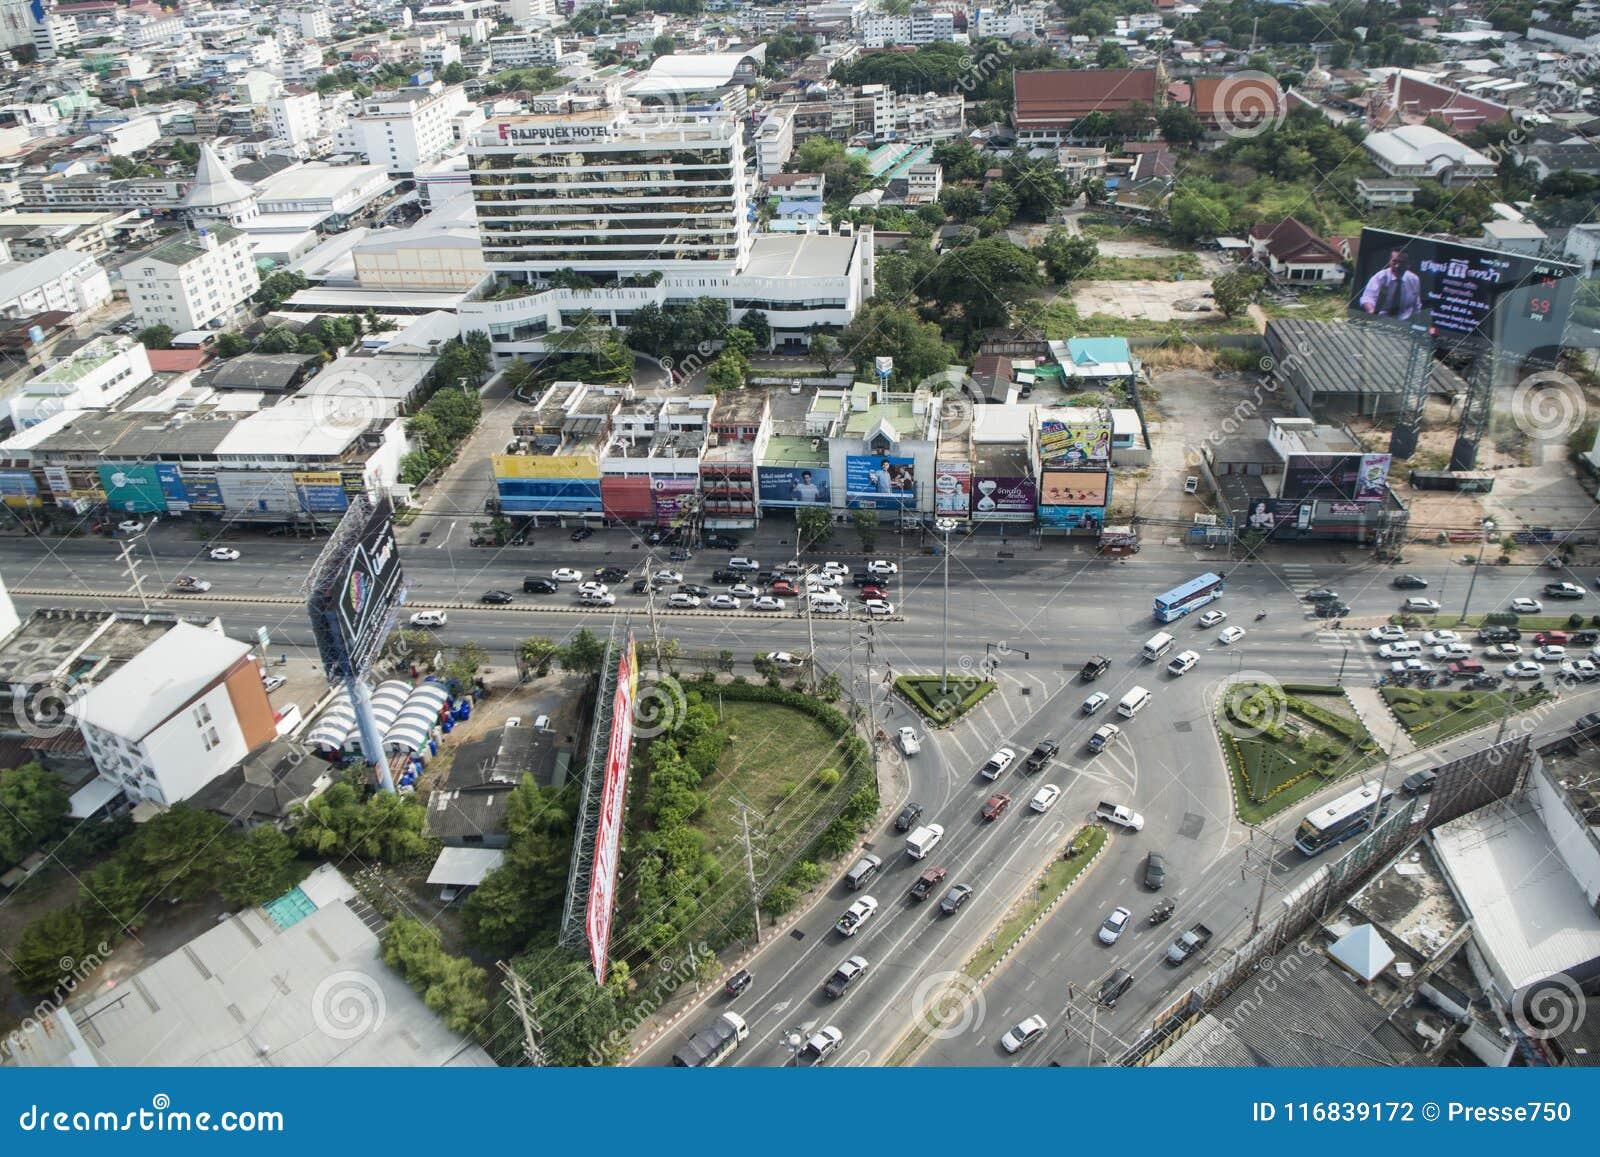 THAILAND ISAN KHORAT CITY VIEW